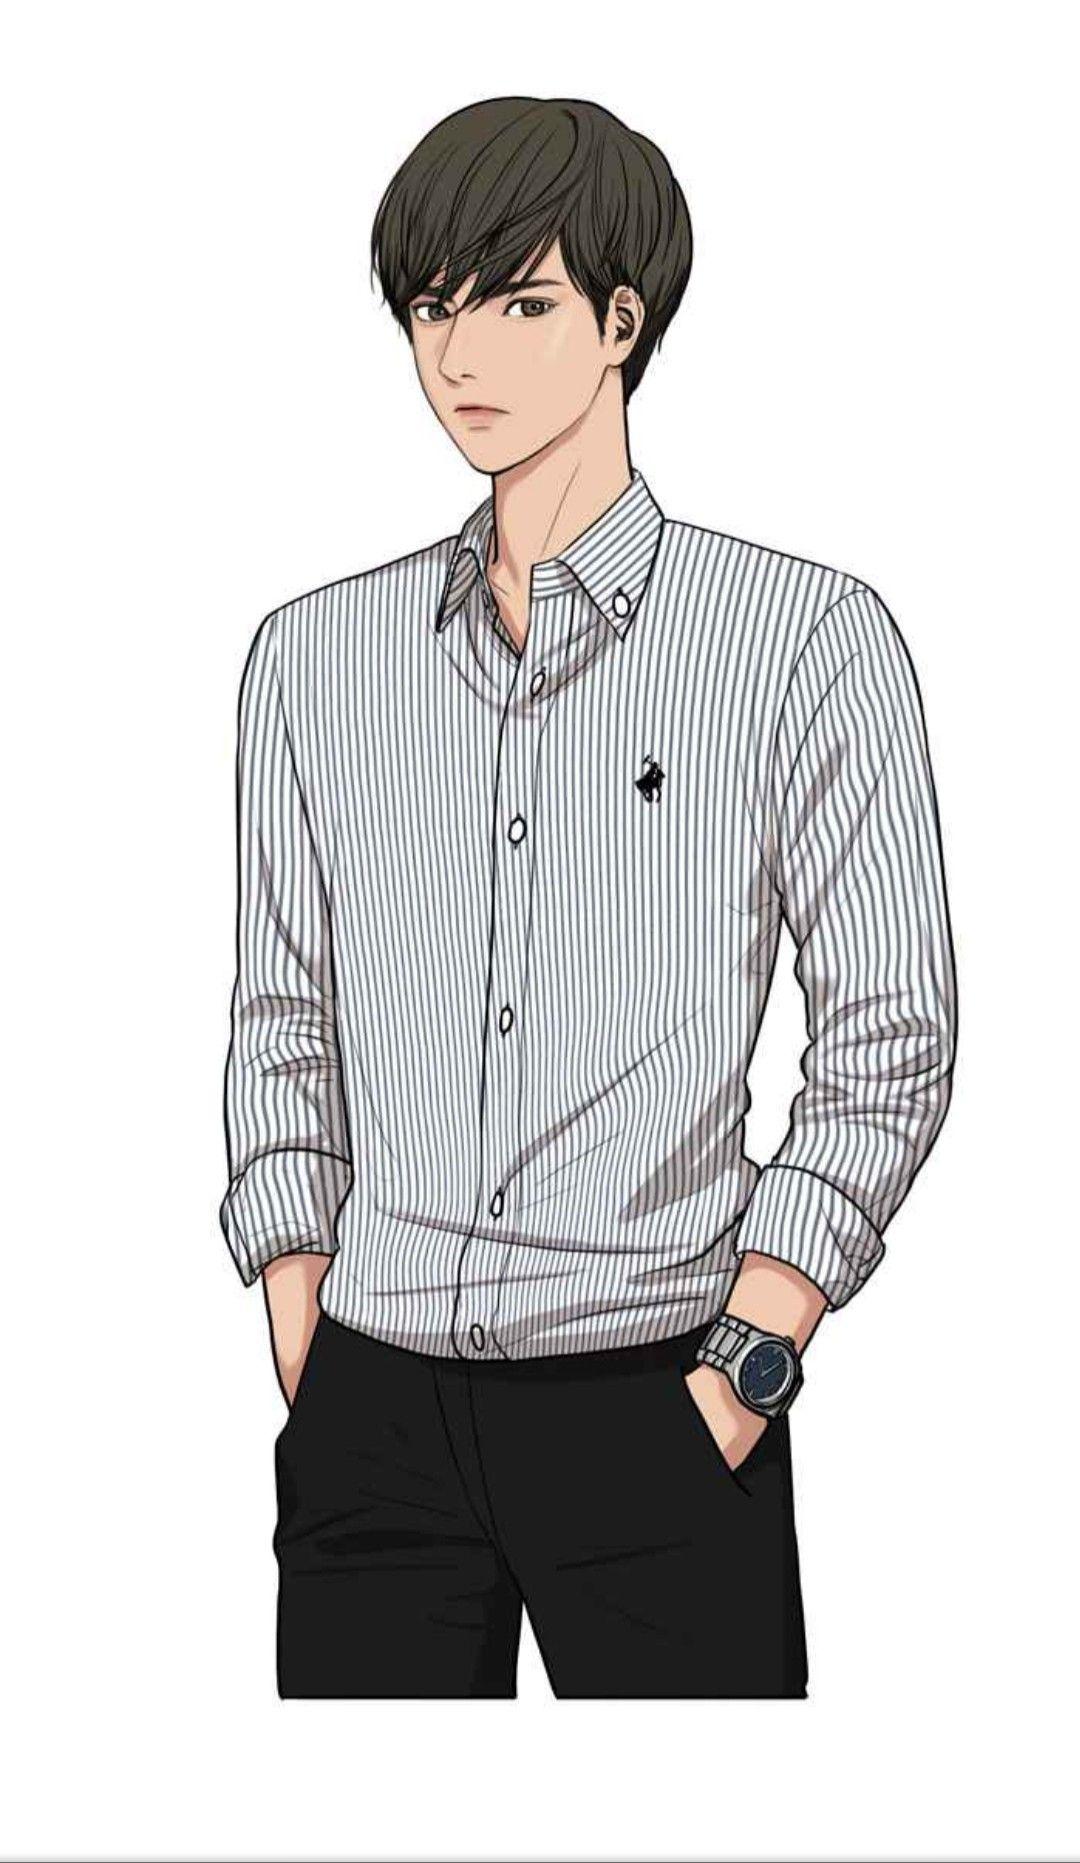 Pin oleh Wiji di webtoon Orang animasi, Gambar wajah